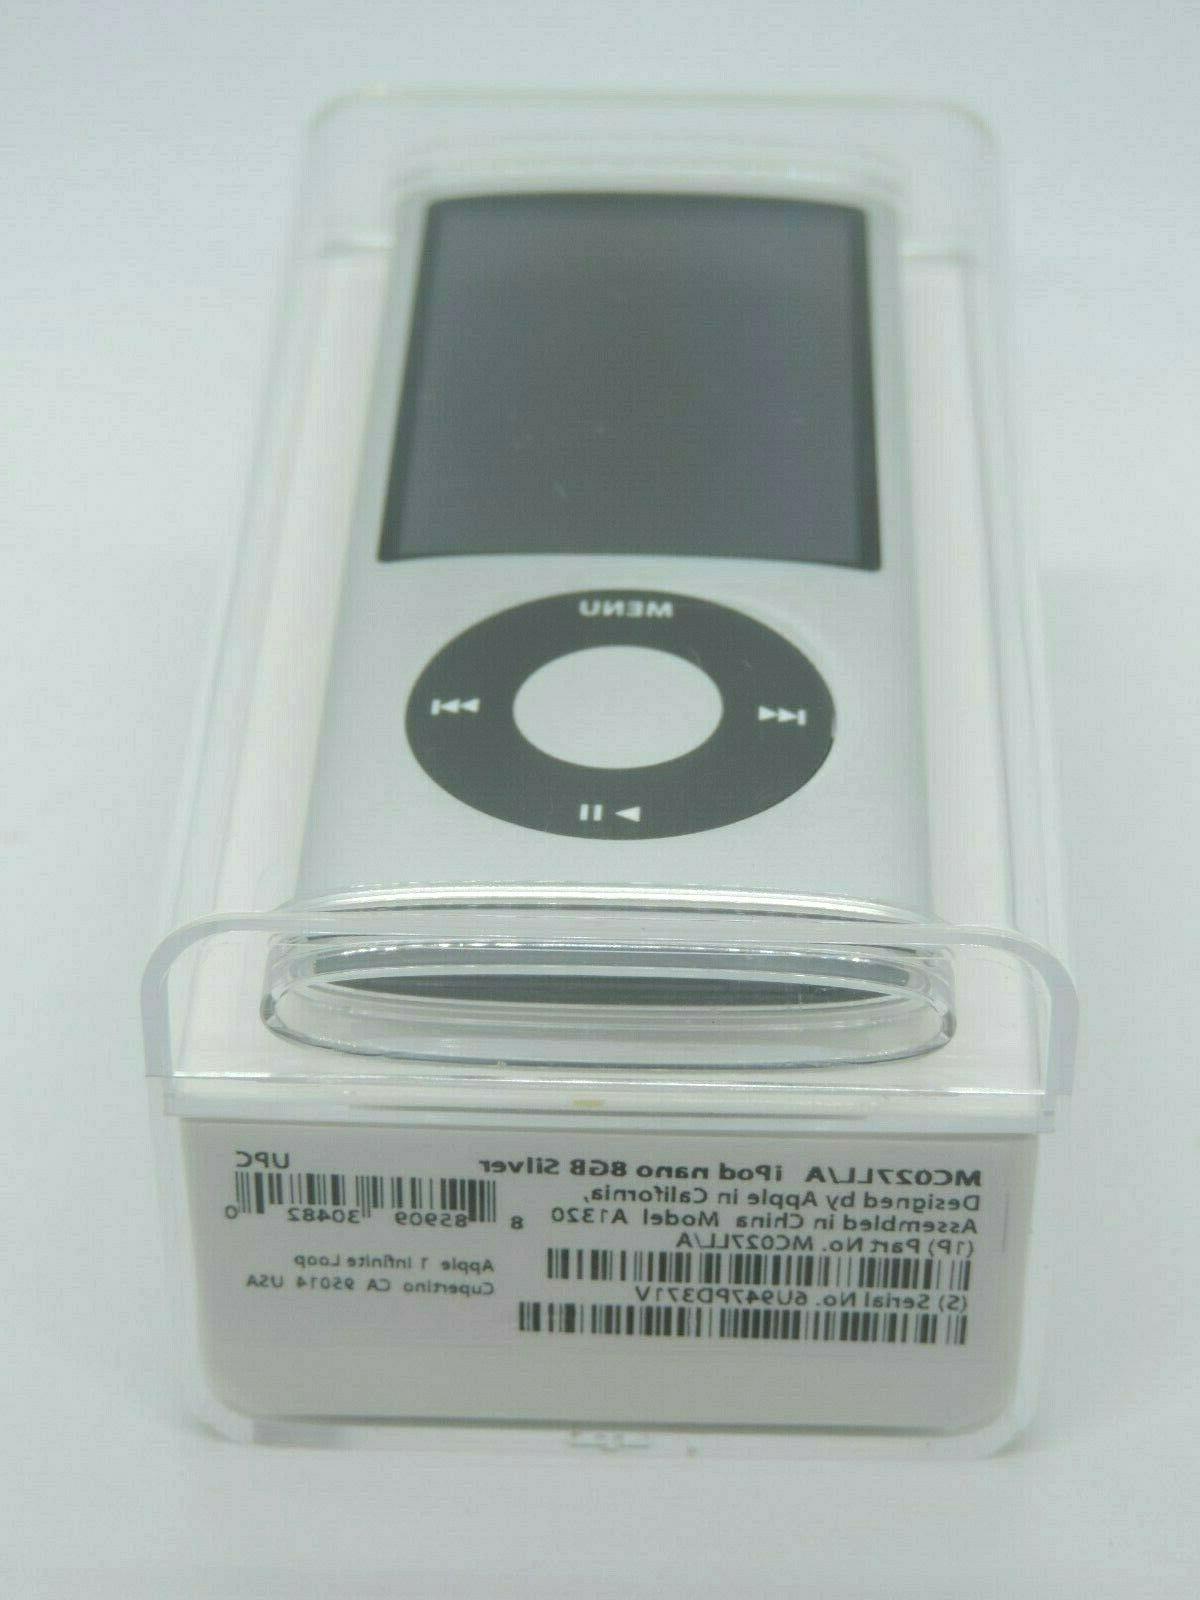 Apple iPod nano 5th Generation Player